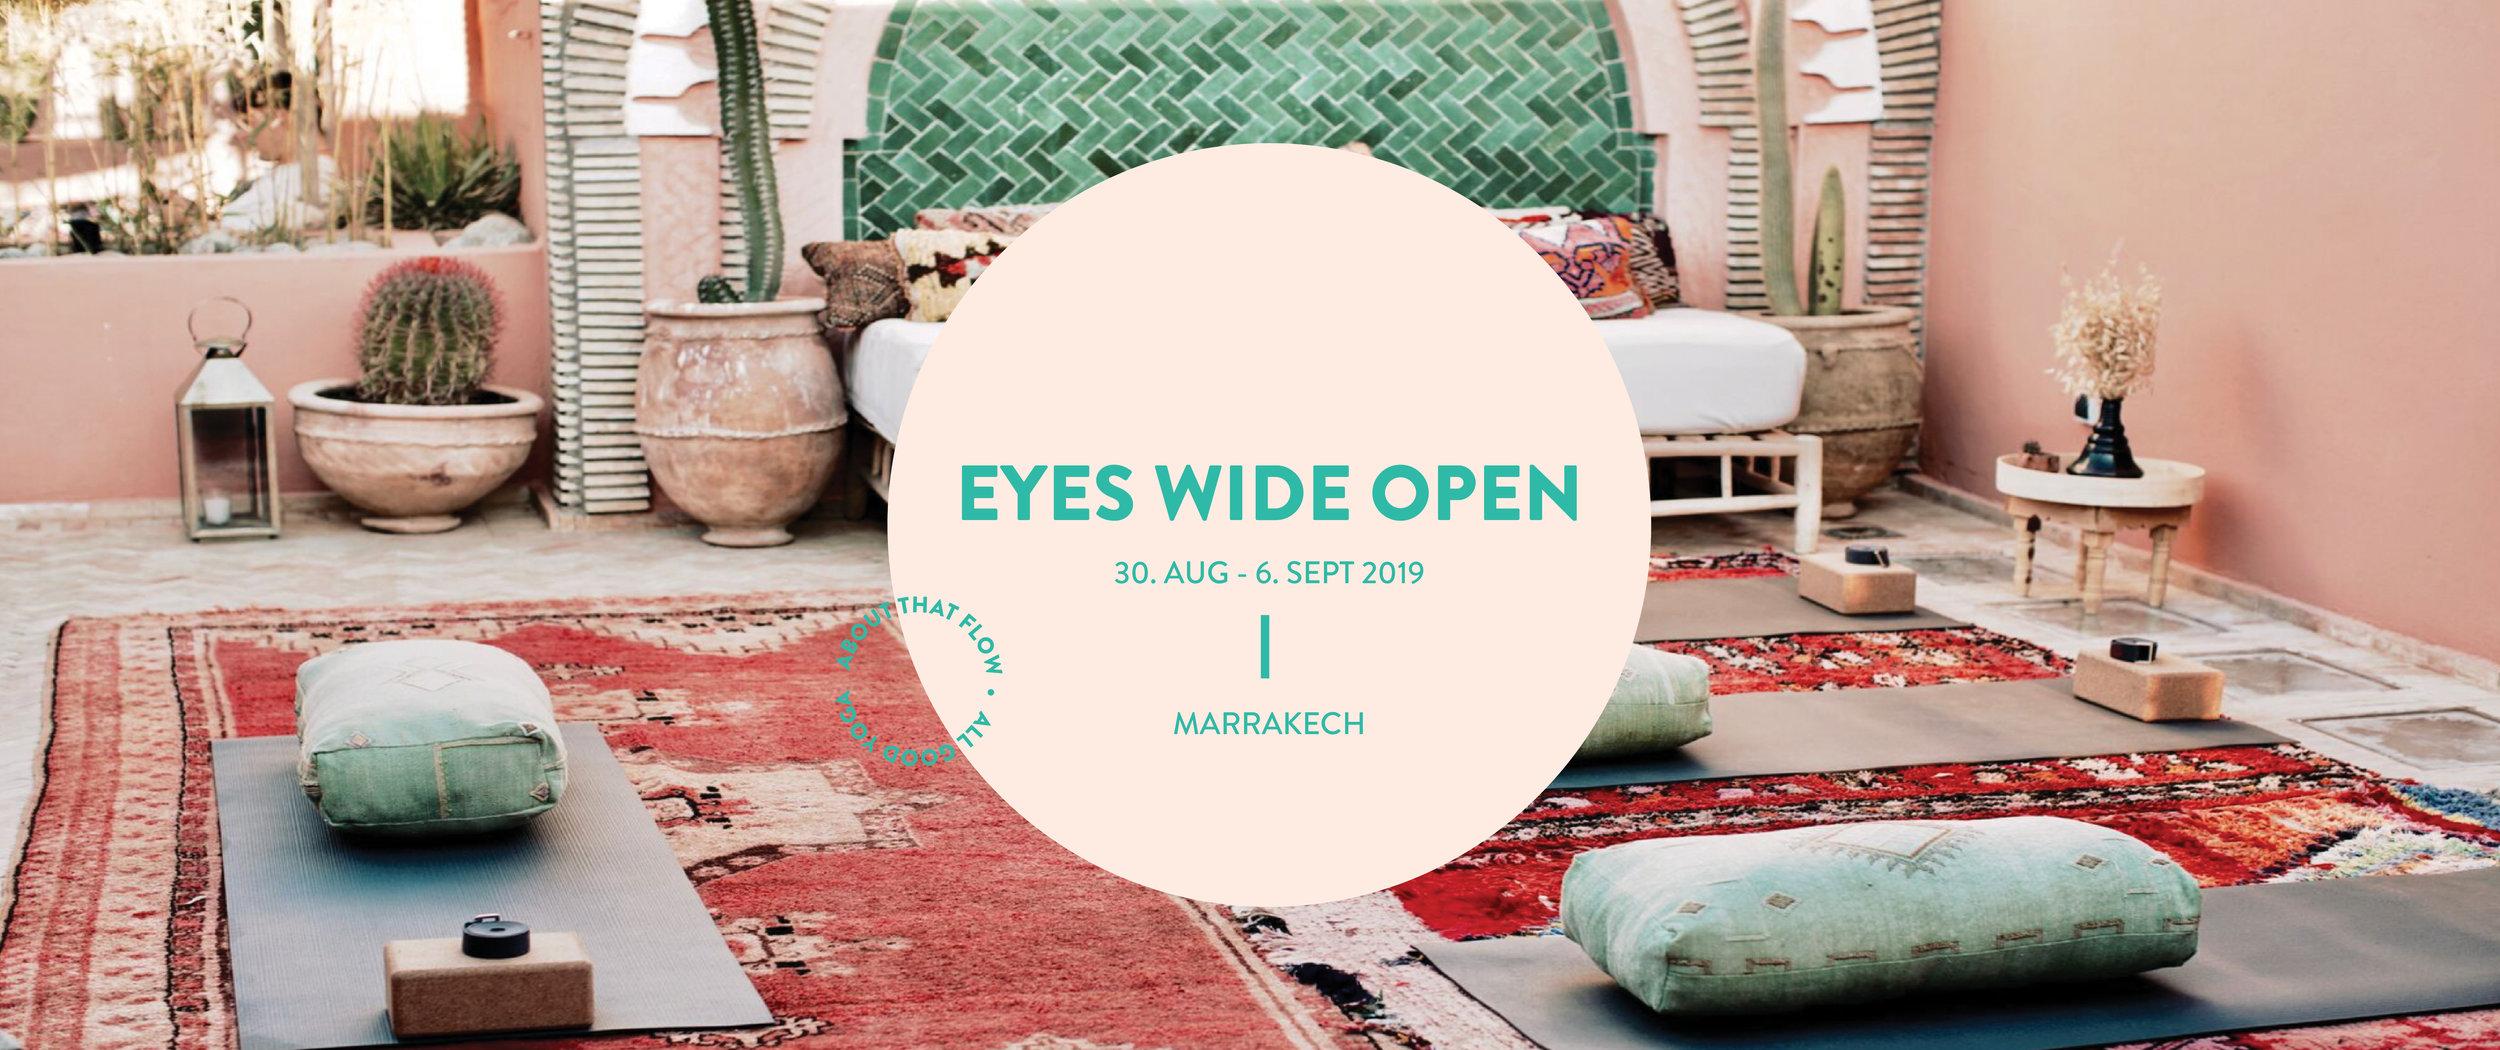 Event_Marrakesh22.jpg